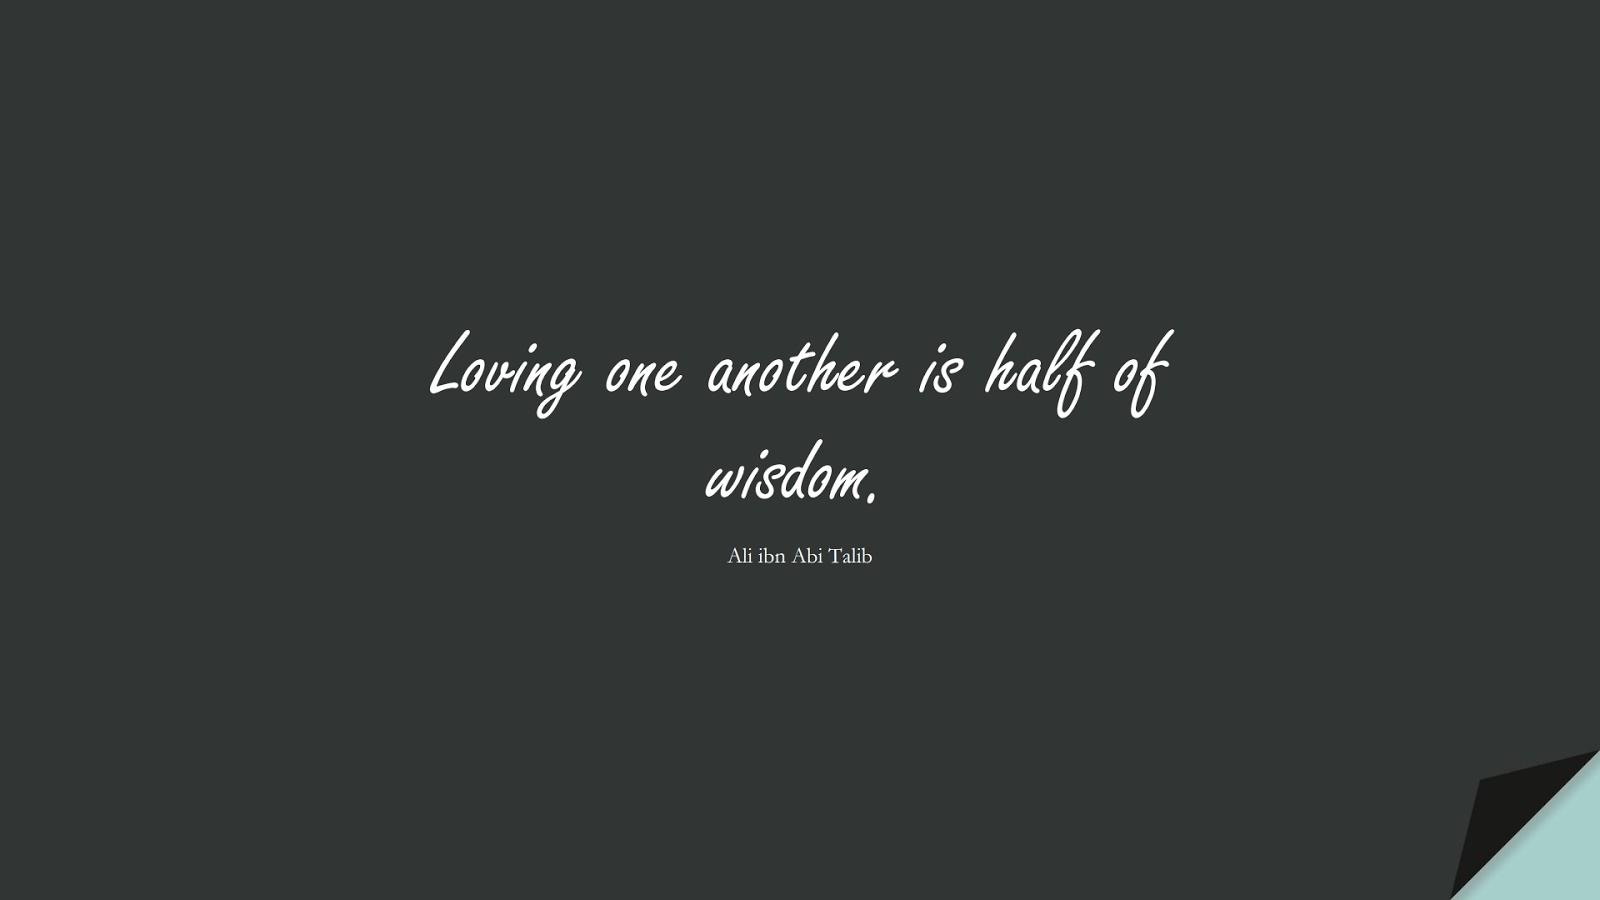 Loving one another is half of wisdom. (Ali ibn Abi Talib);  #AliQuotes